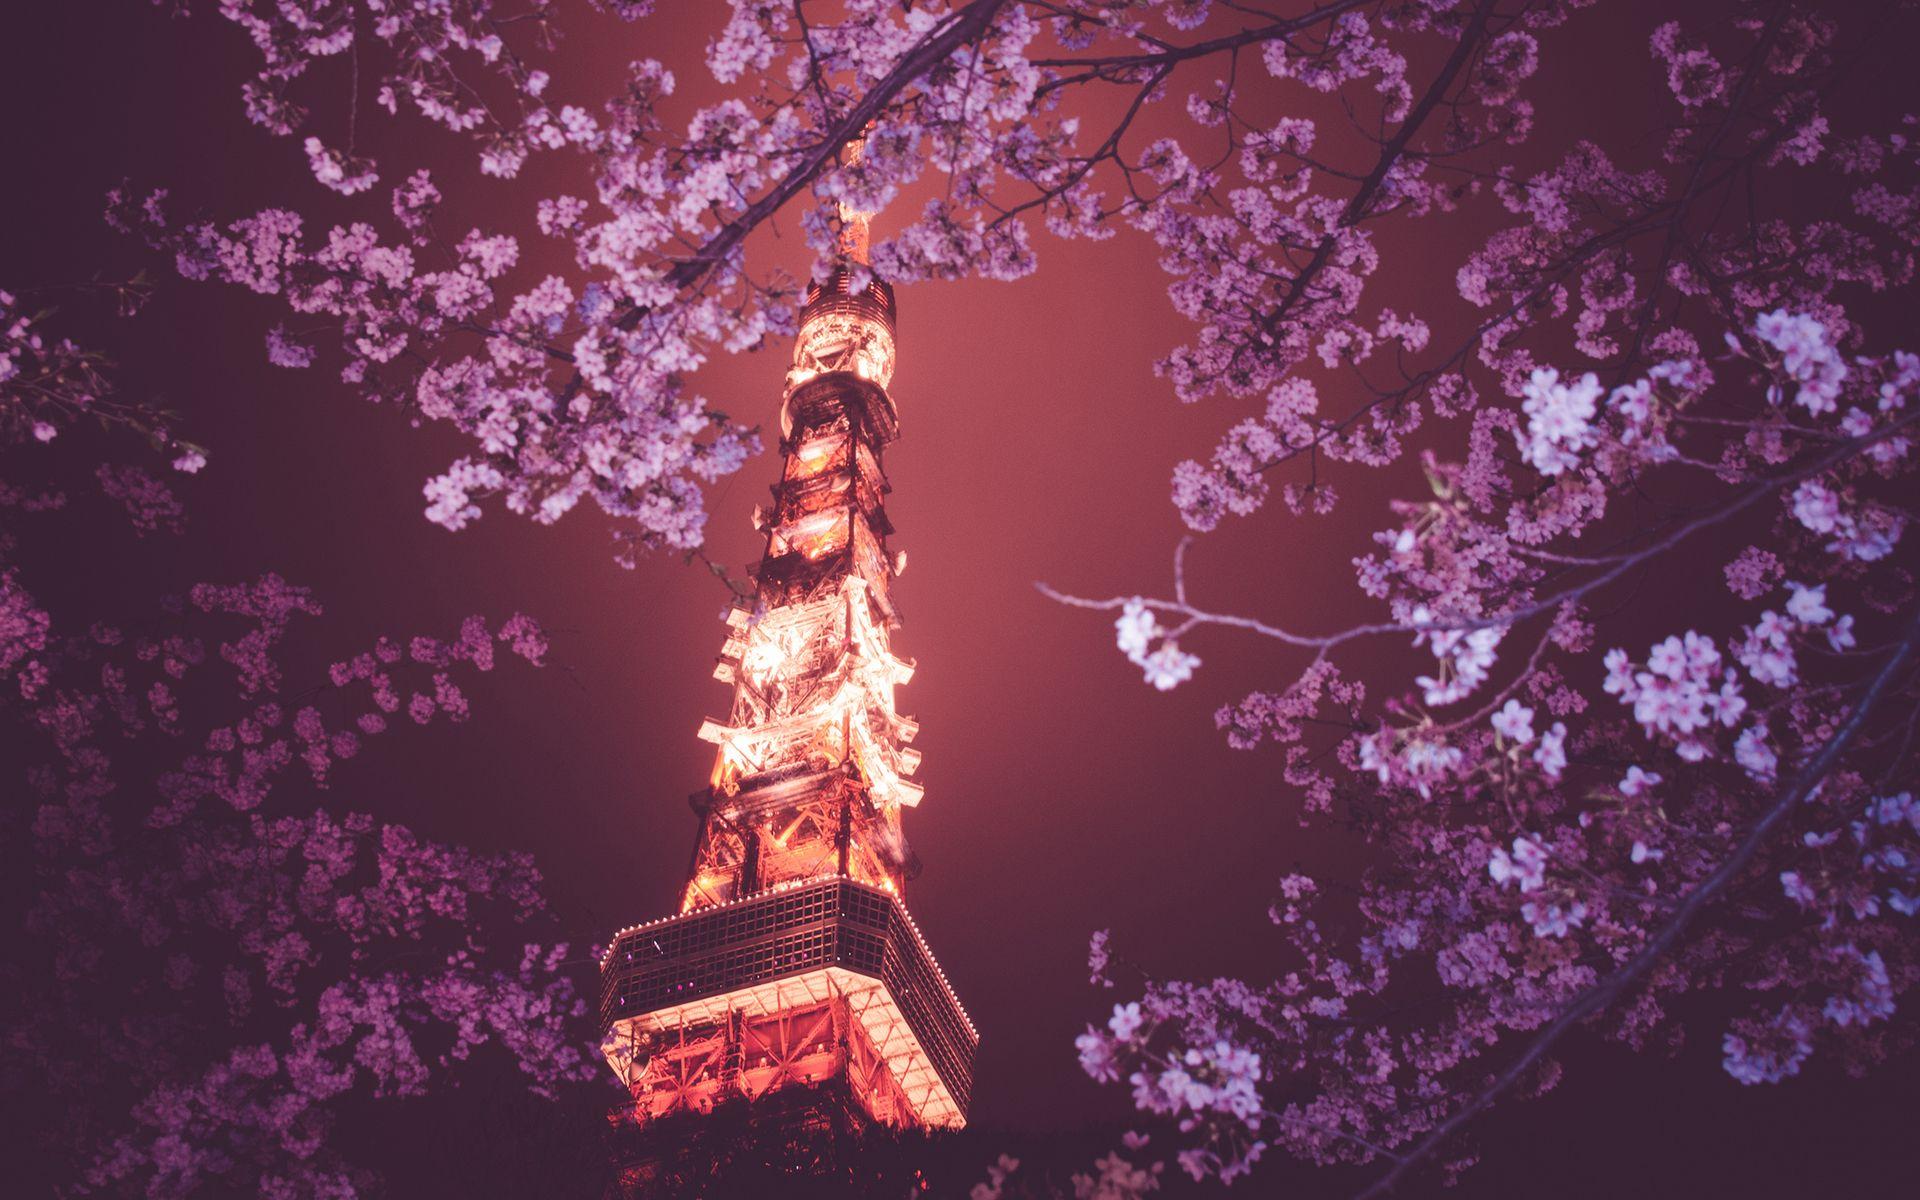 Tokyo Tower Tokyo Cherry Blossom Tree Flowers Night Lights Tokyo Tower Tower Tokyo Night